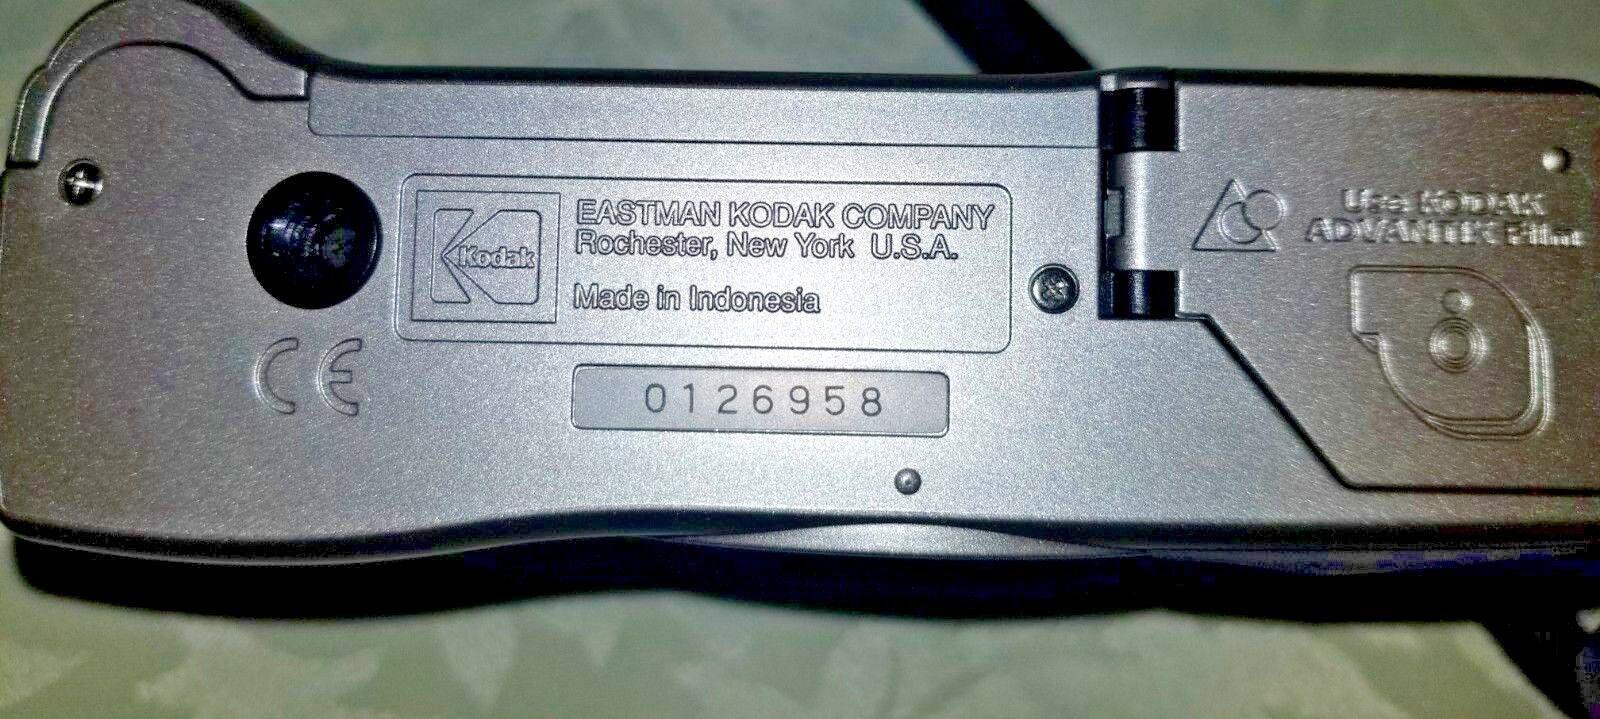 Kodak Advantix C650 Zoom APS Point & Shoot Film Camera image 5